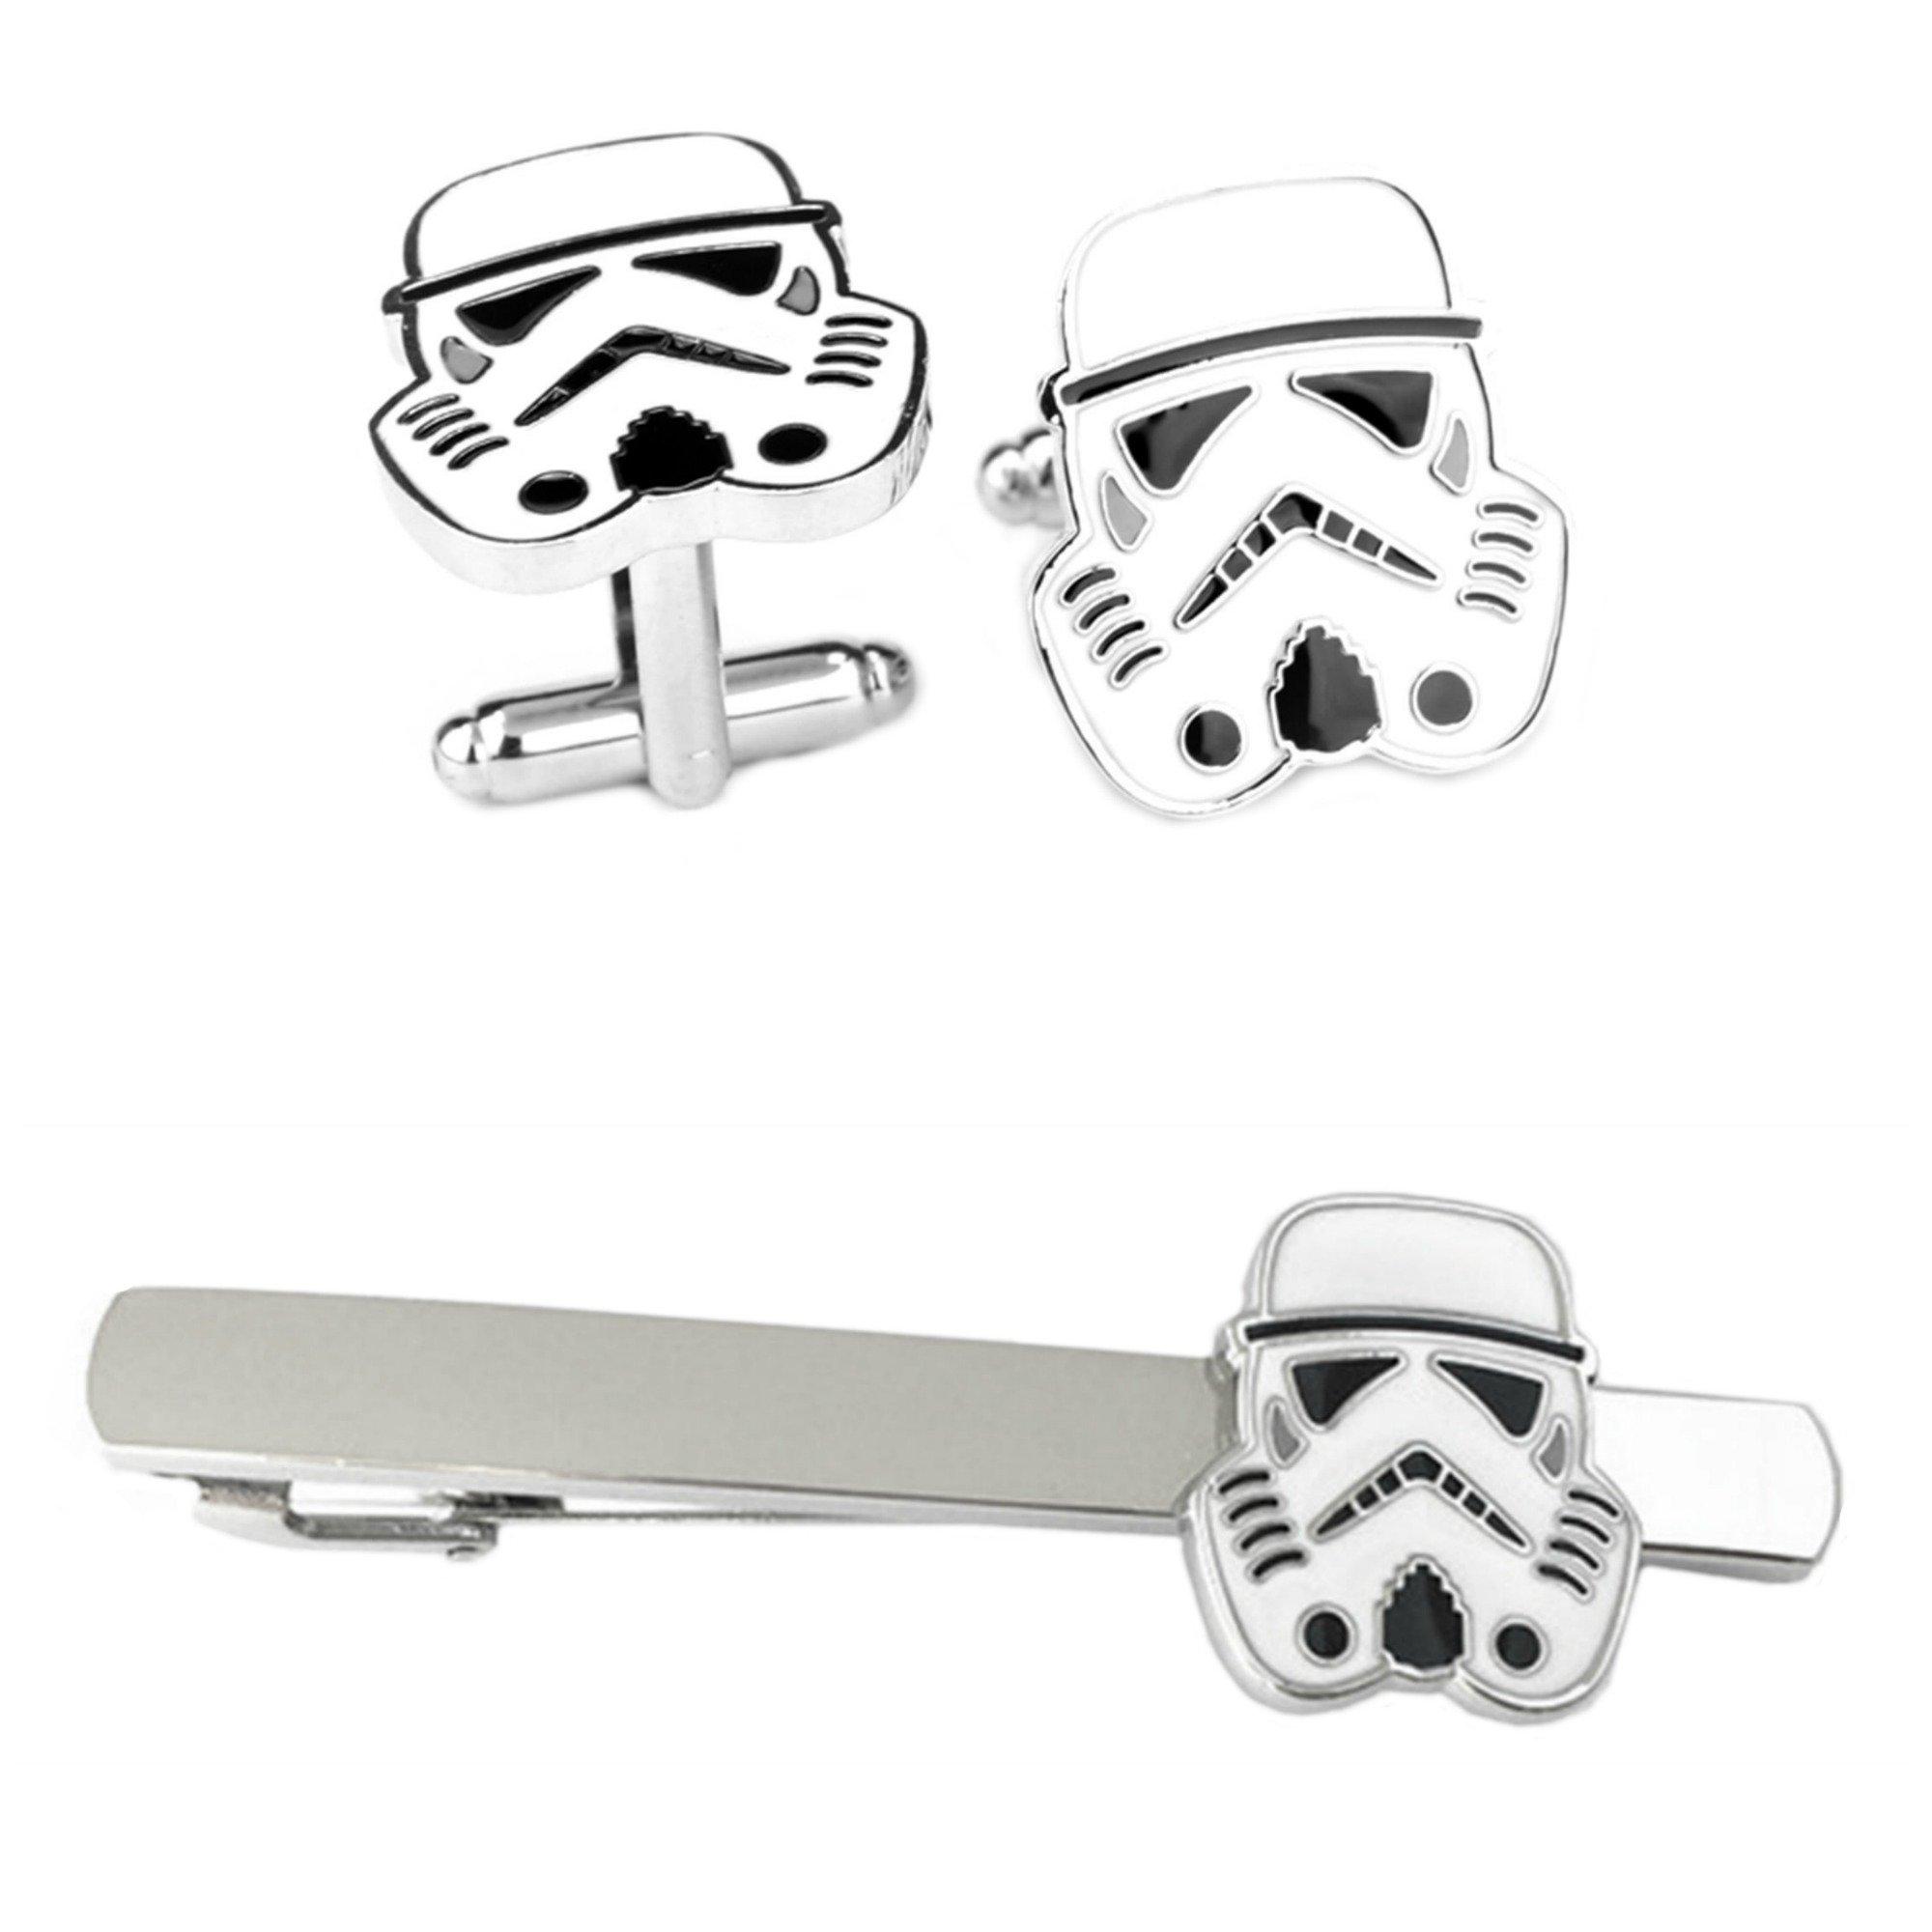 Outlander Storm Trooper Cufflink &Tiebar - New 2018 Star Wars Movies - Set of 2 Wedding Logo w/Gift Box